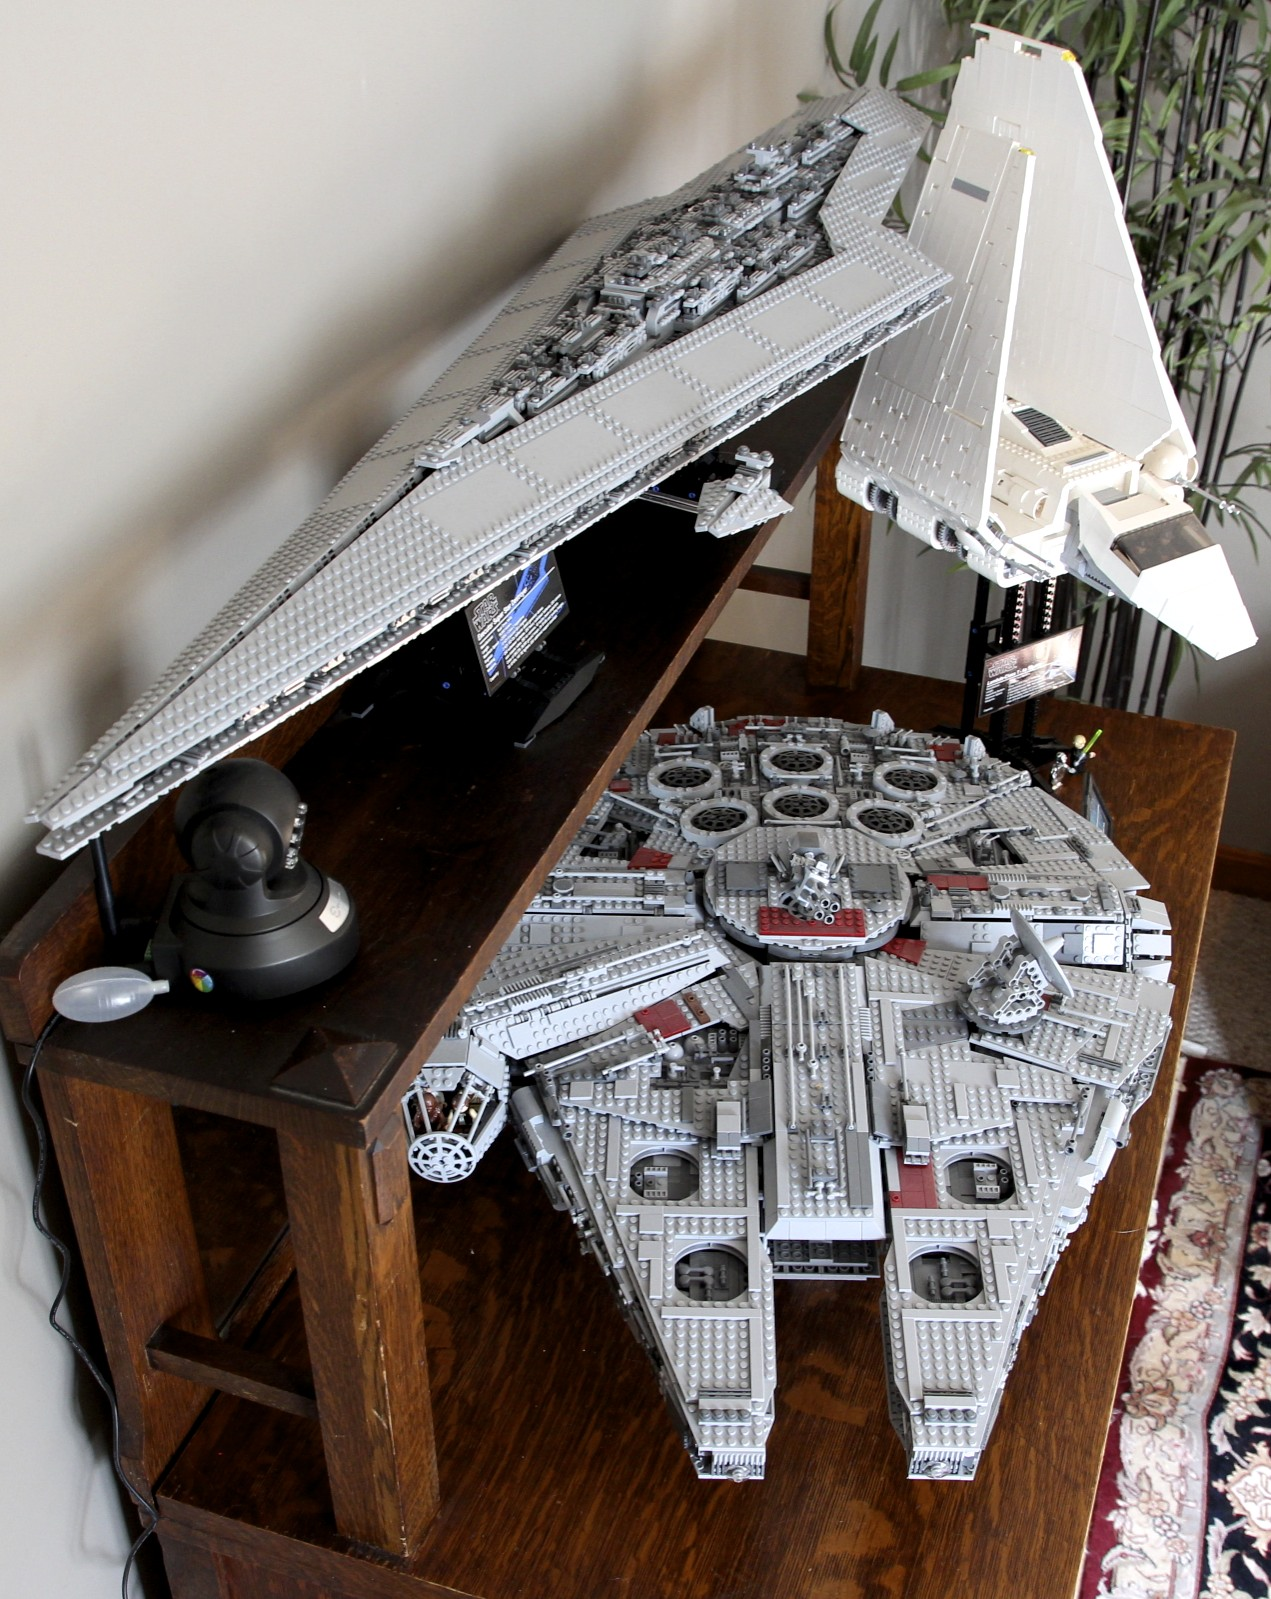 LEGO Super Star Destroyer, Millenium Falcon, Imperial Shuttle